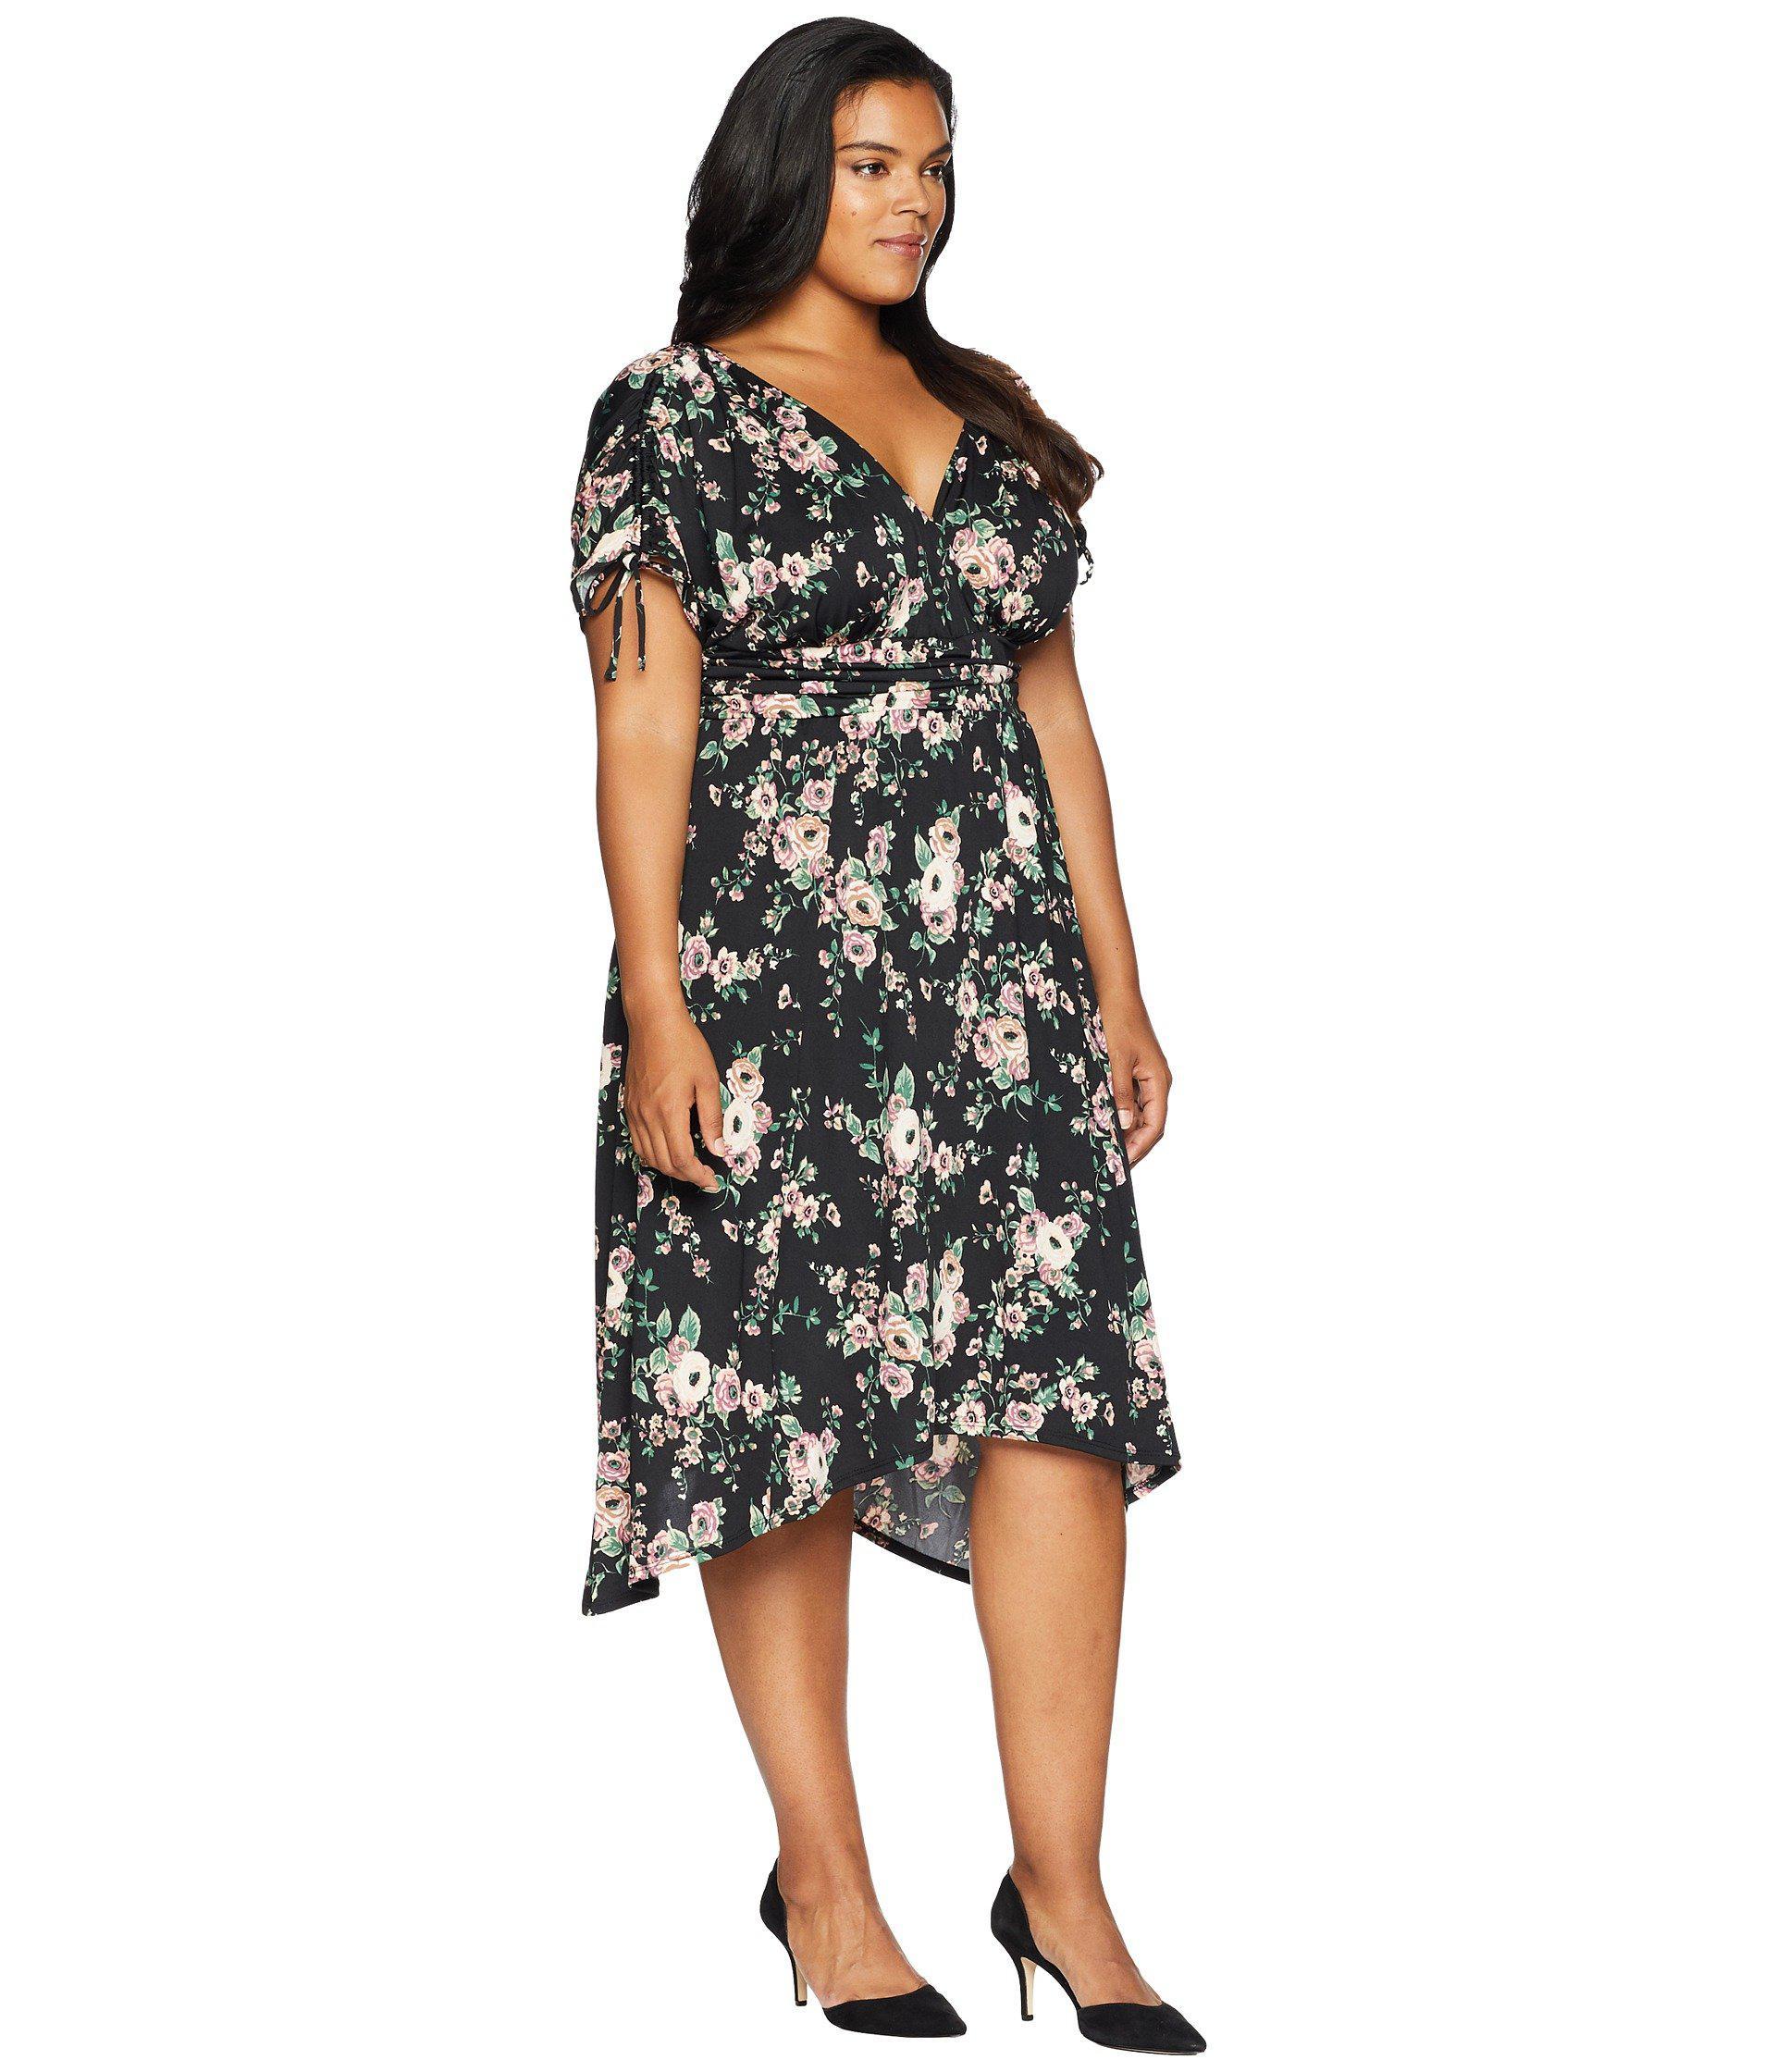 5270157a020 Kiyonna - Black Tessa Ruched Dress - Lyst. View fullscreen